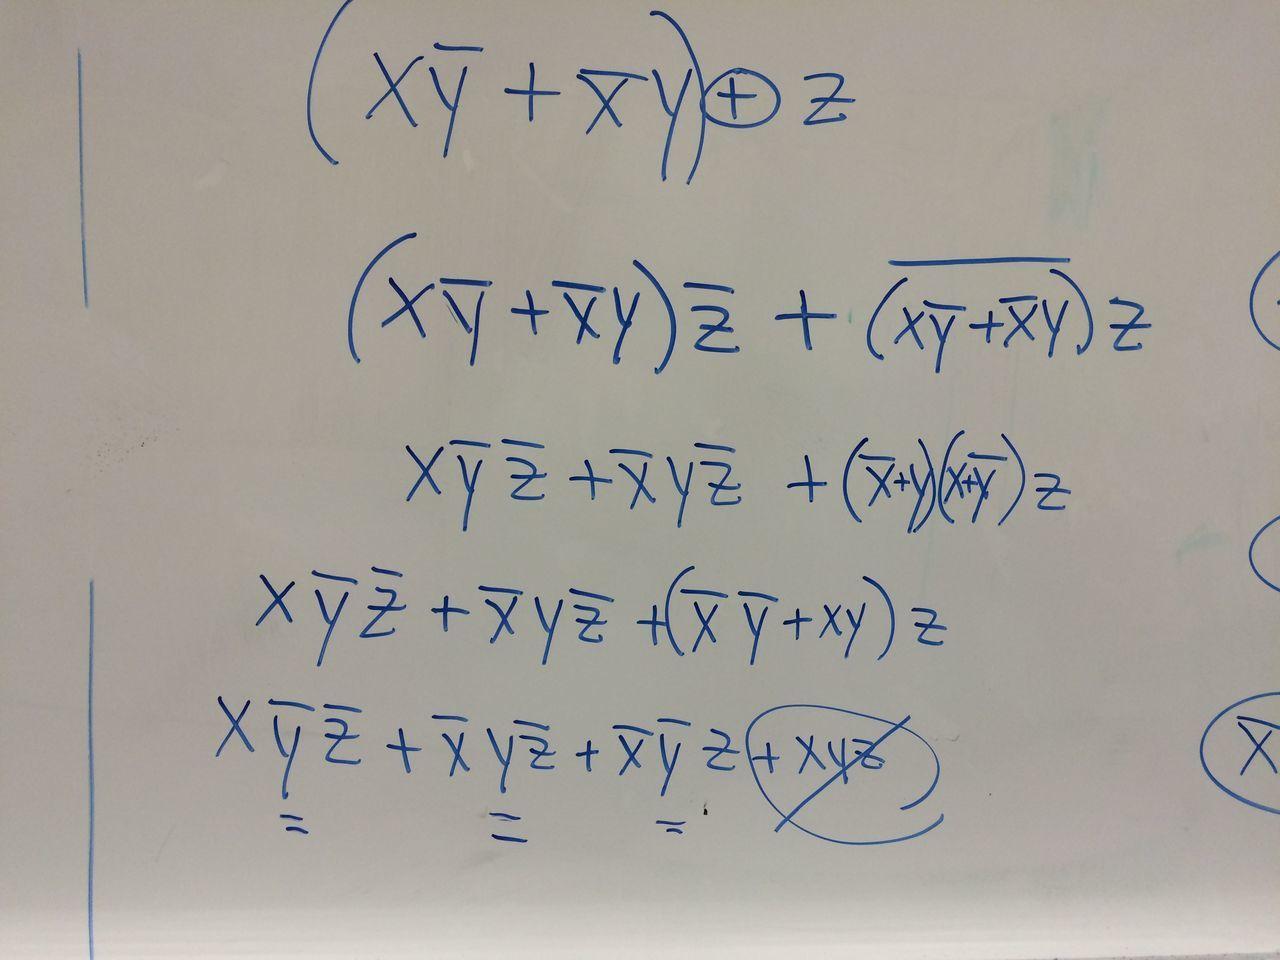 text, formula, education, mathematics, number, communication, learning, solution, whiteboard, indoors, university, algebra, no people, day, close-up